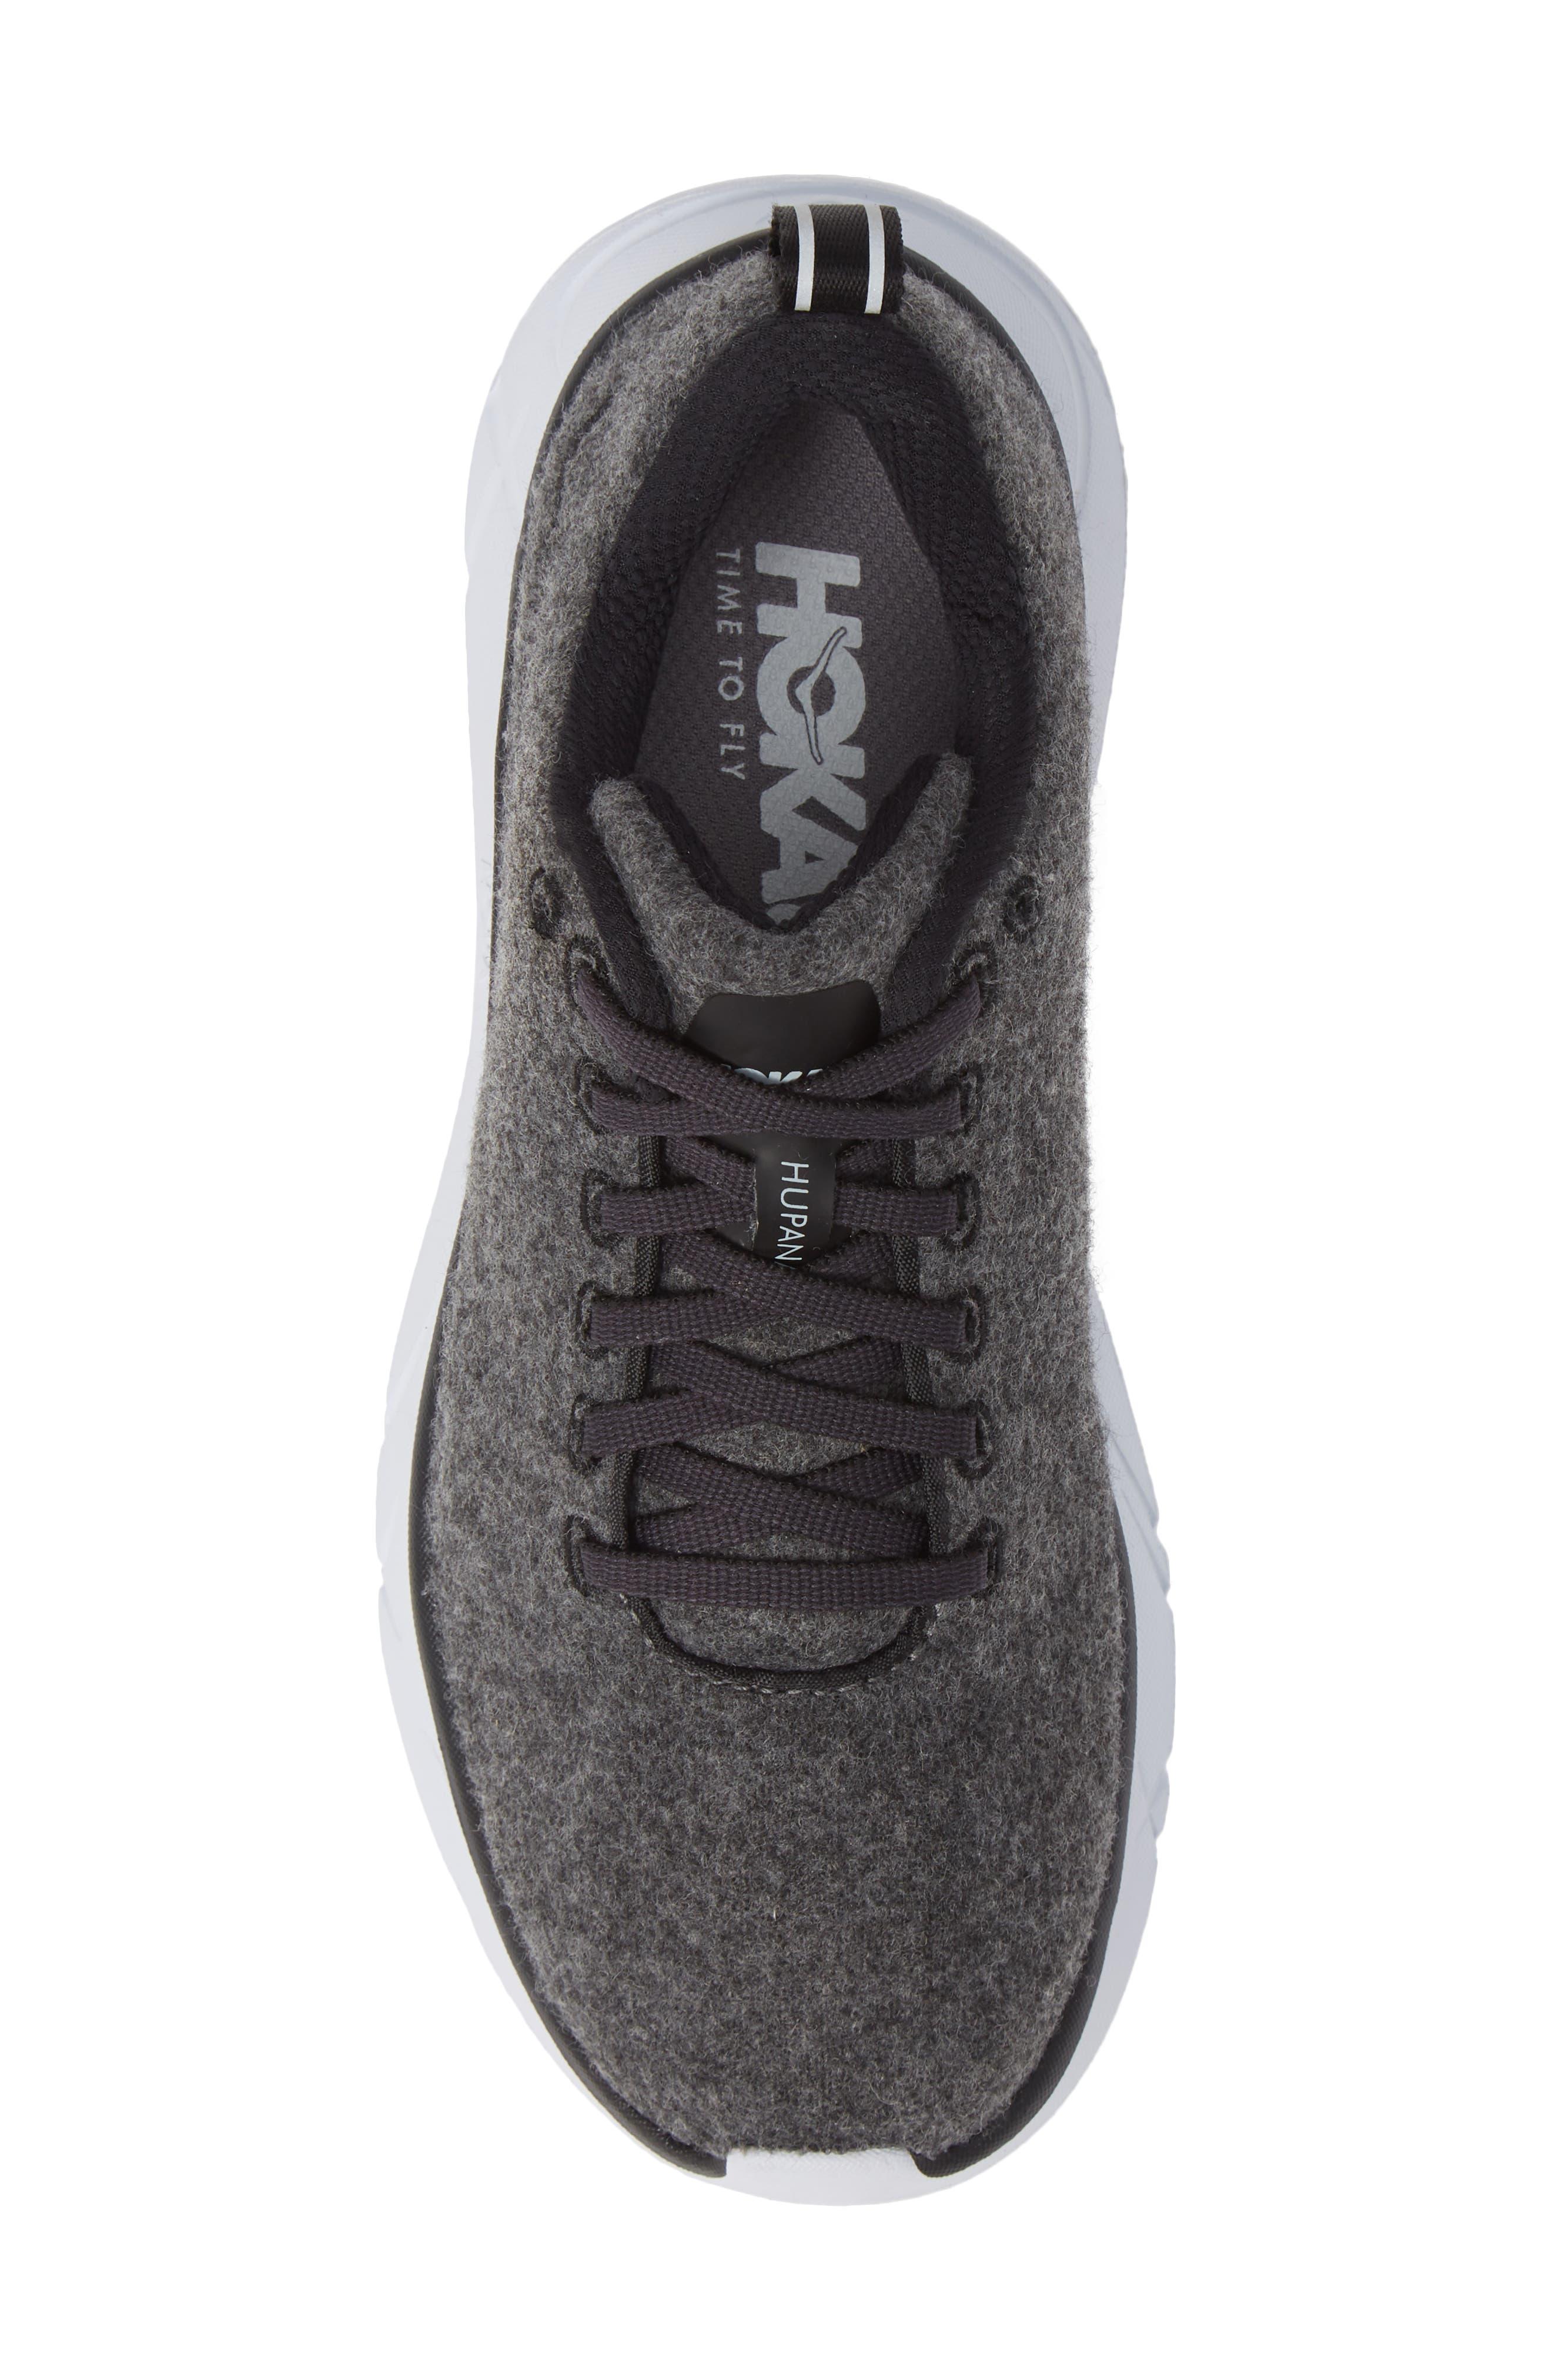 HOKA ONE ONE,                              Hupana Wool Sneaker,                             Alternate thumbnail 5, color,                             023